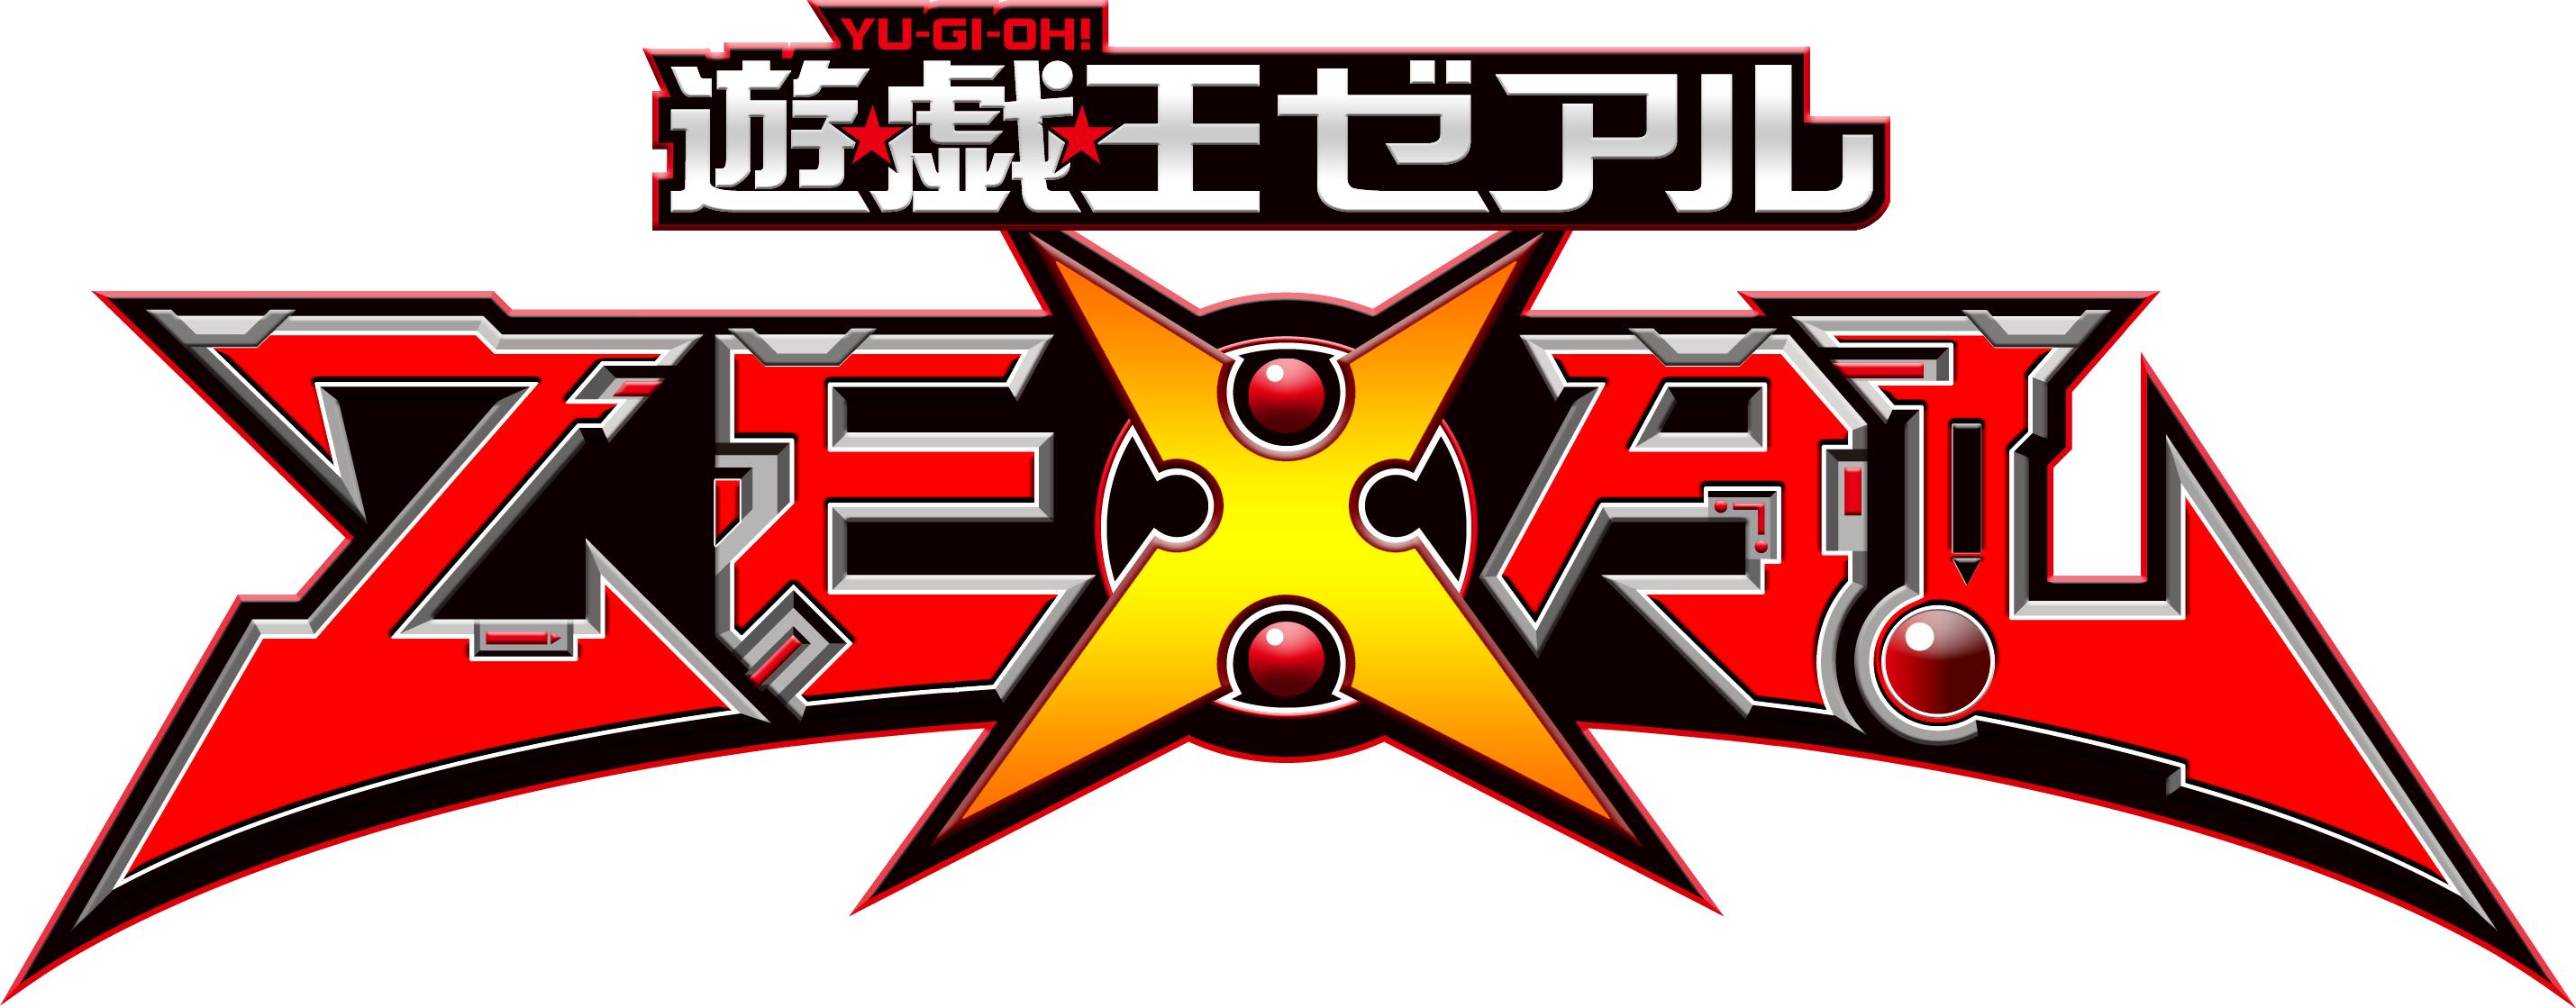 Prime Trading Logo photo - 1